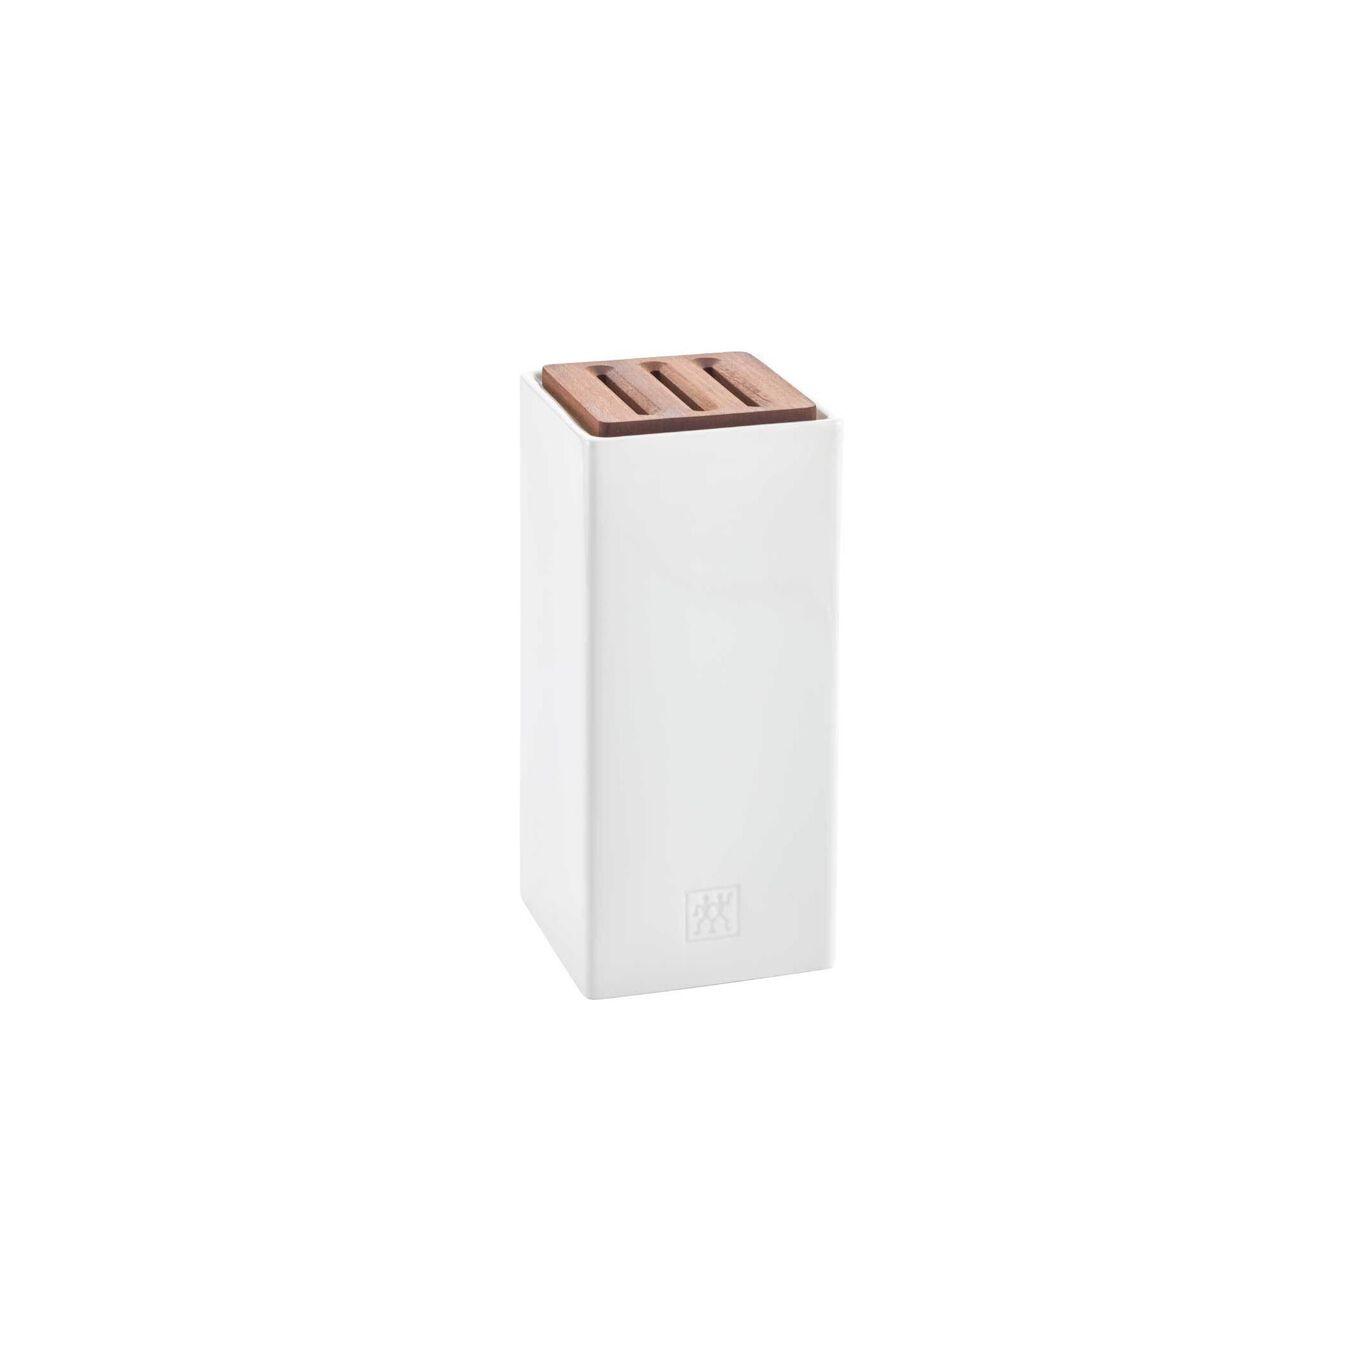 Aufbewahrungsgefäß Set, 4-tlg | Keramik,,large 5